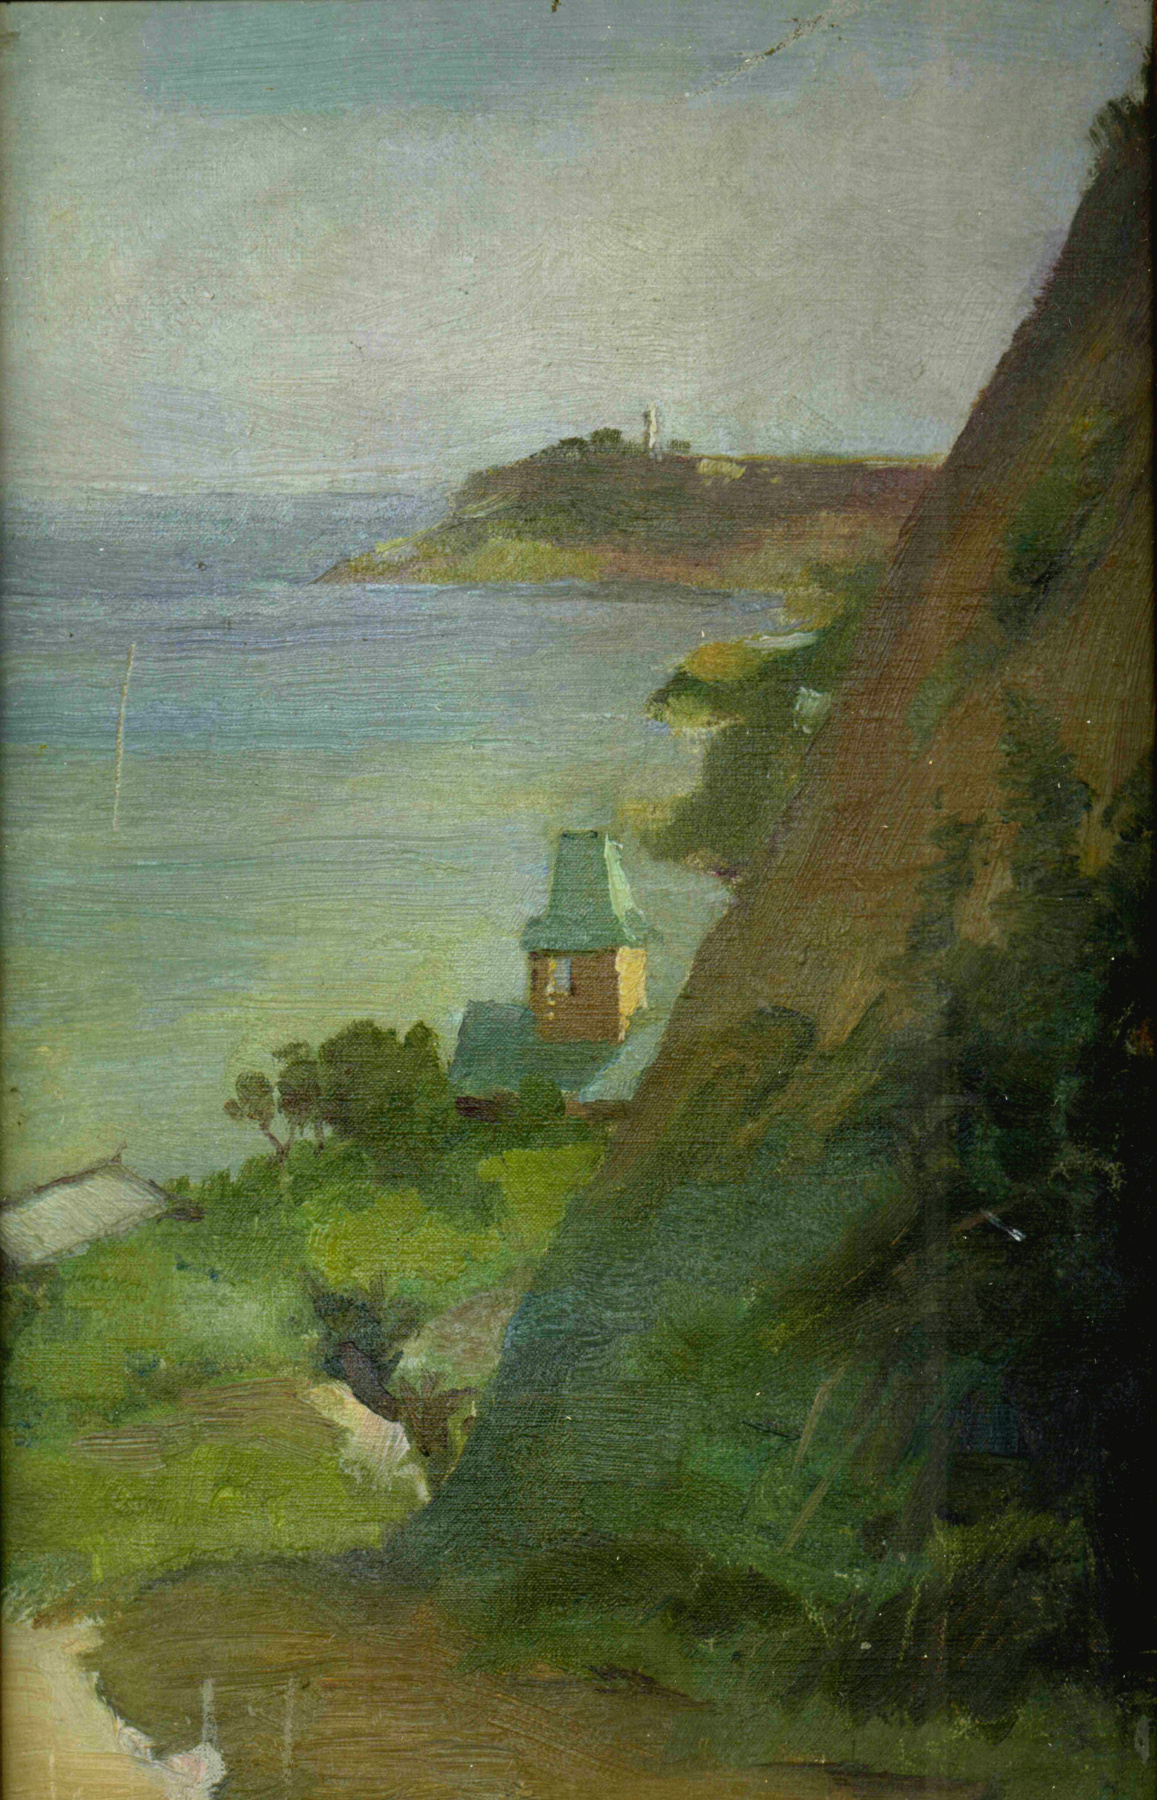 Eugene Iosifovich Bukovetsky. The surroundings of Odessa, the shore of the Big Fountain